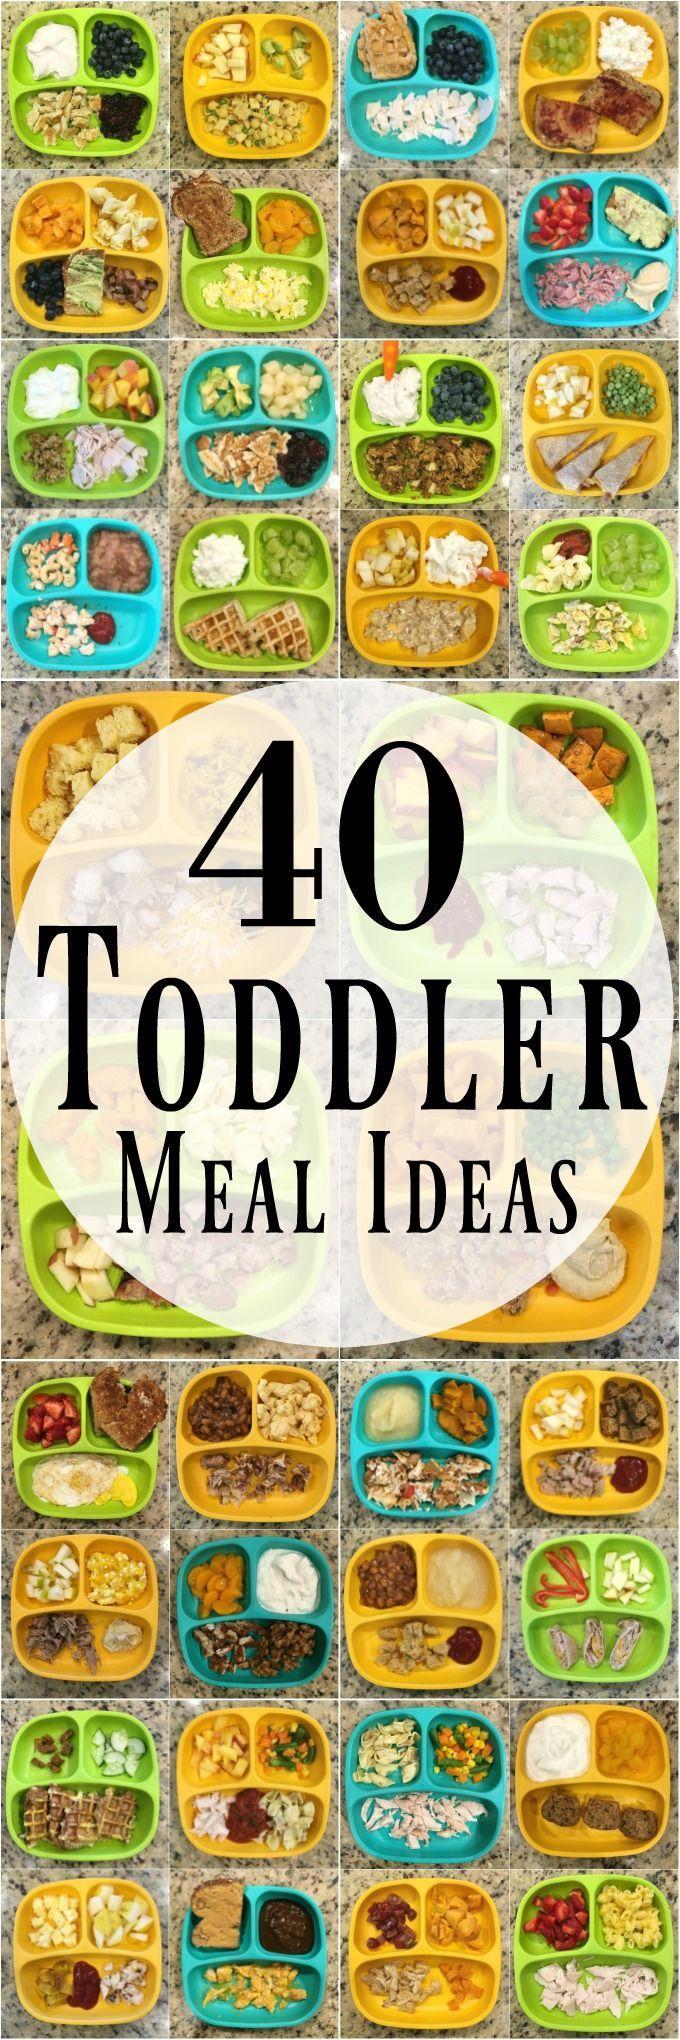 40 healthy toddler meals best of the lean green bean pinterest essen f r kleinkinder. Black Bedroom Furniture Sets. Home Design Ideas